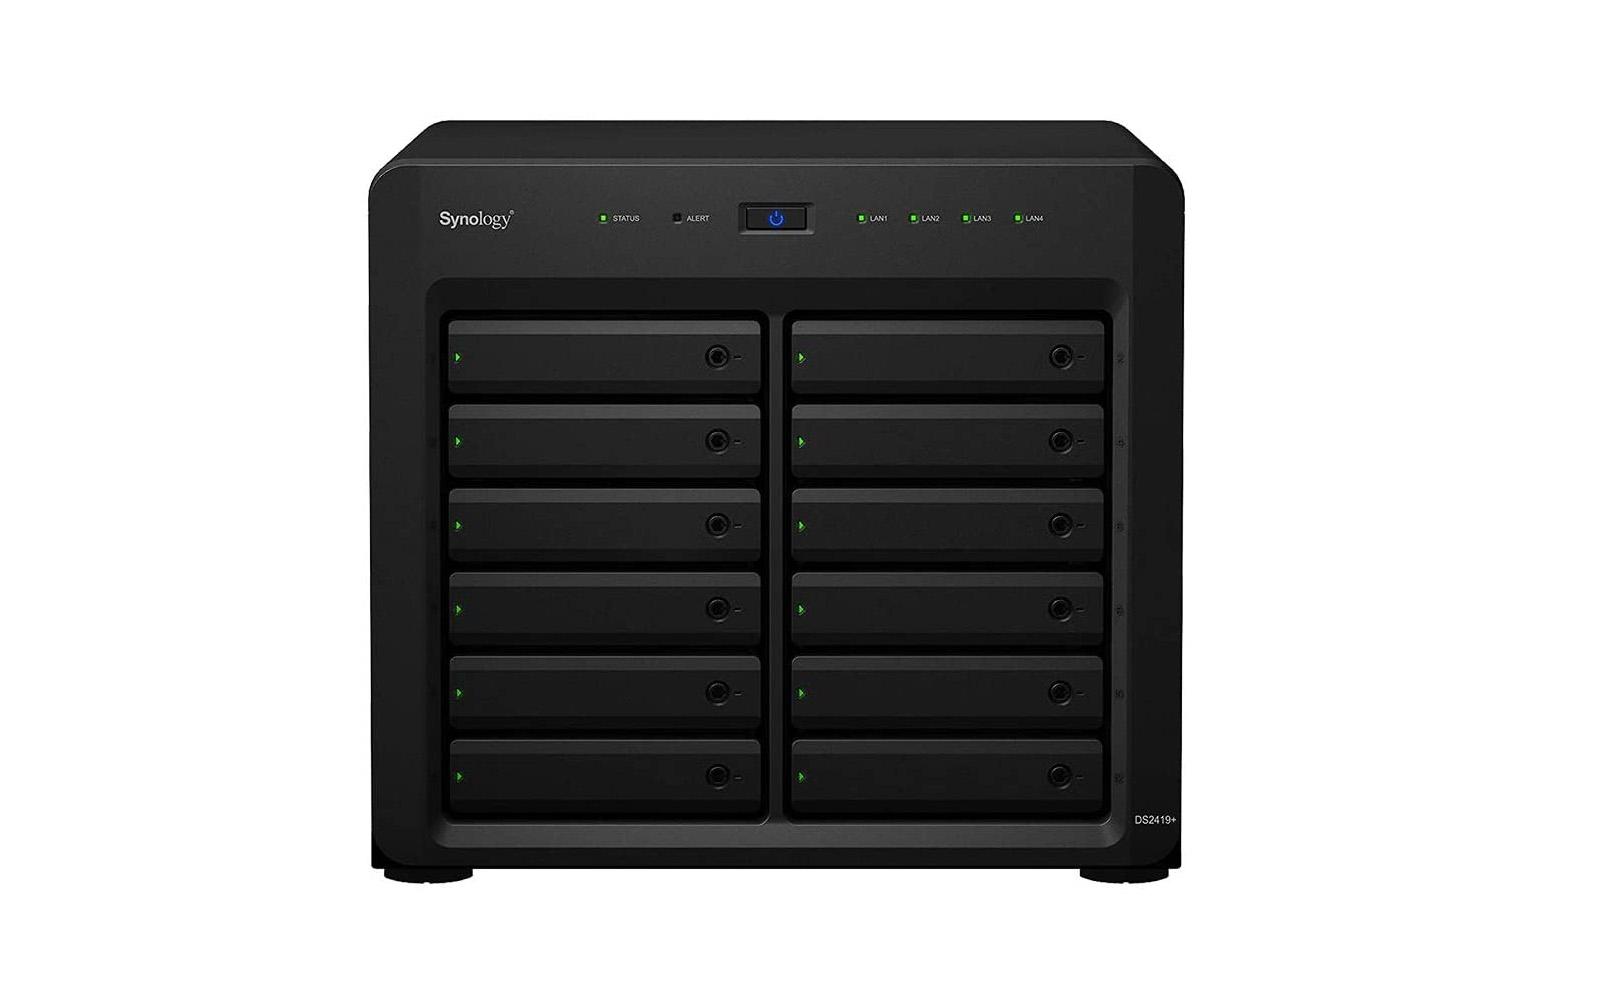 Synology DiskStation DS2419+ iSCSI NAS Server, 24TB SSD Storage